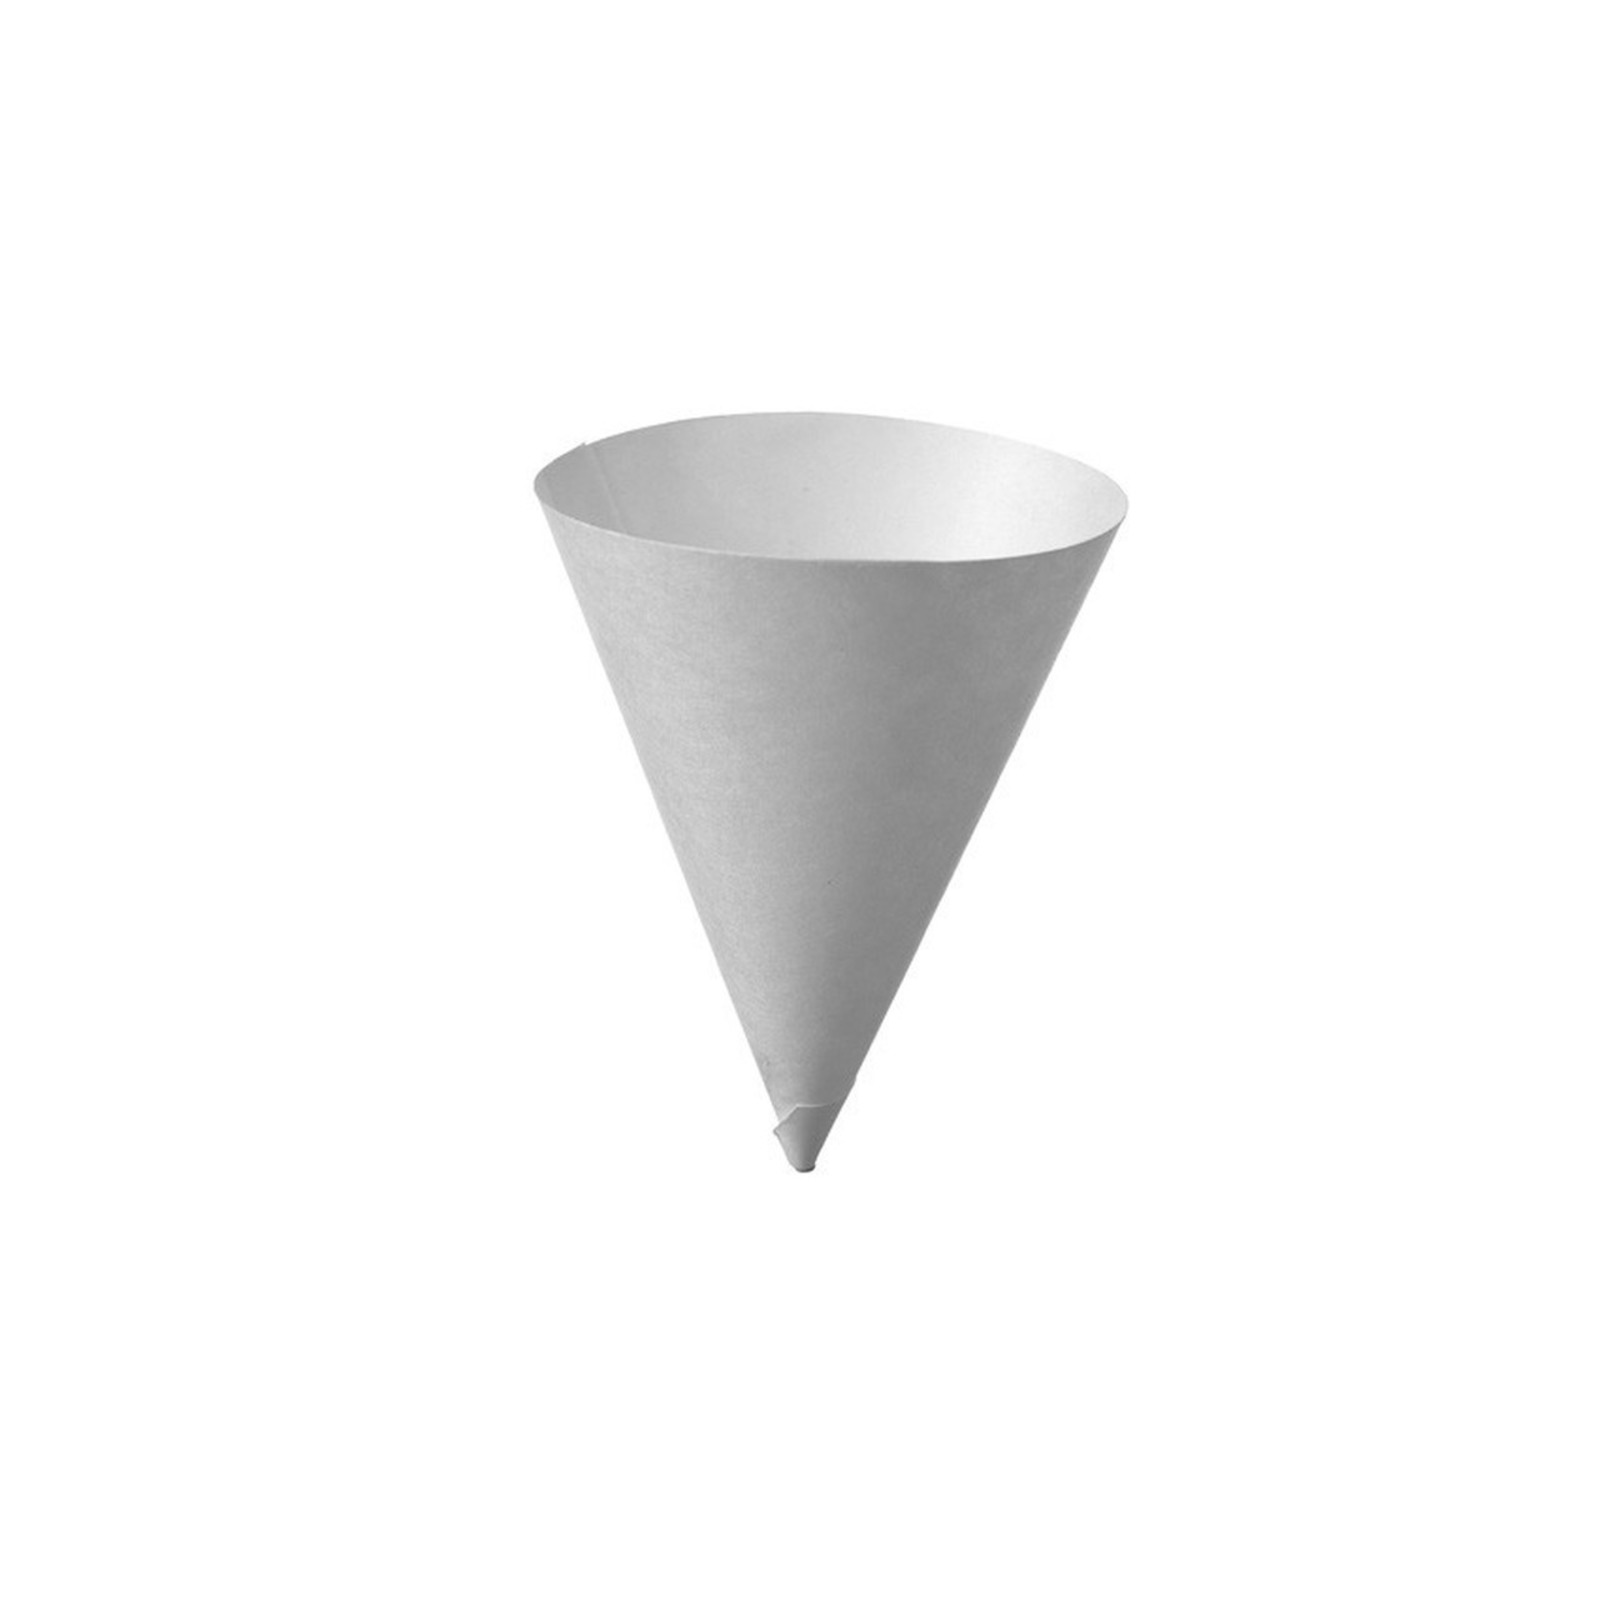 MTRADE Disposable 4 Oz Paper Cone Cup